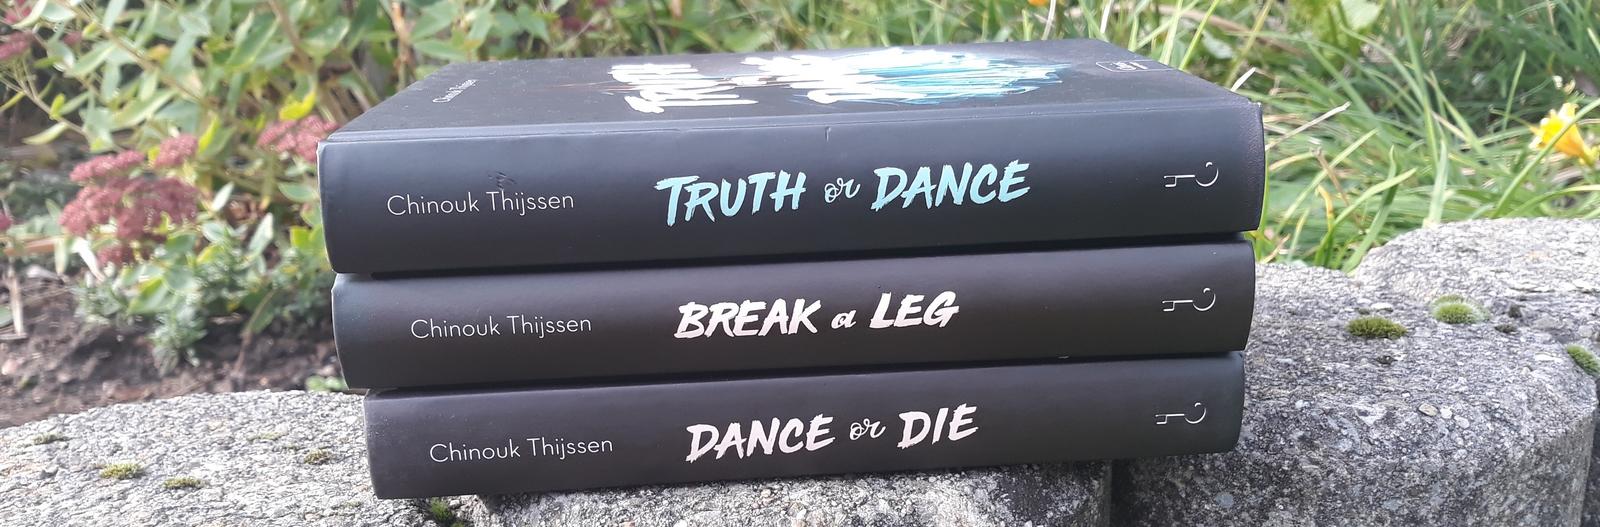 Truth or dance trilogie